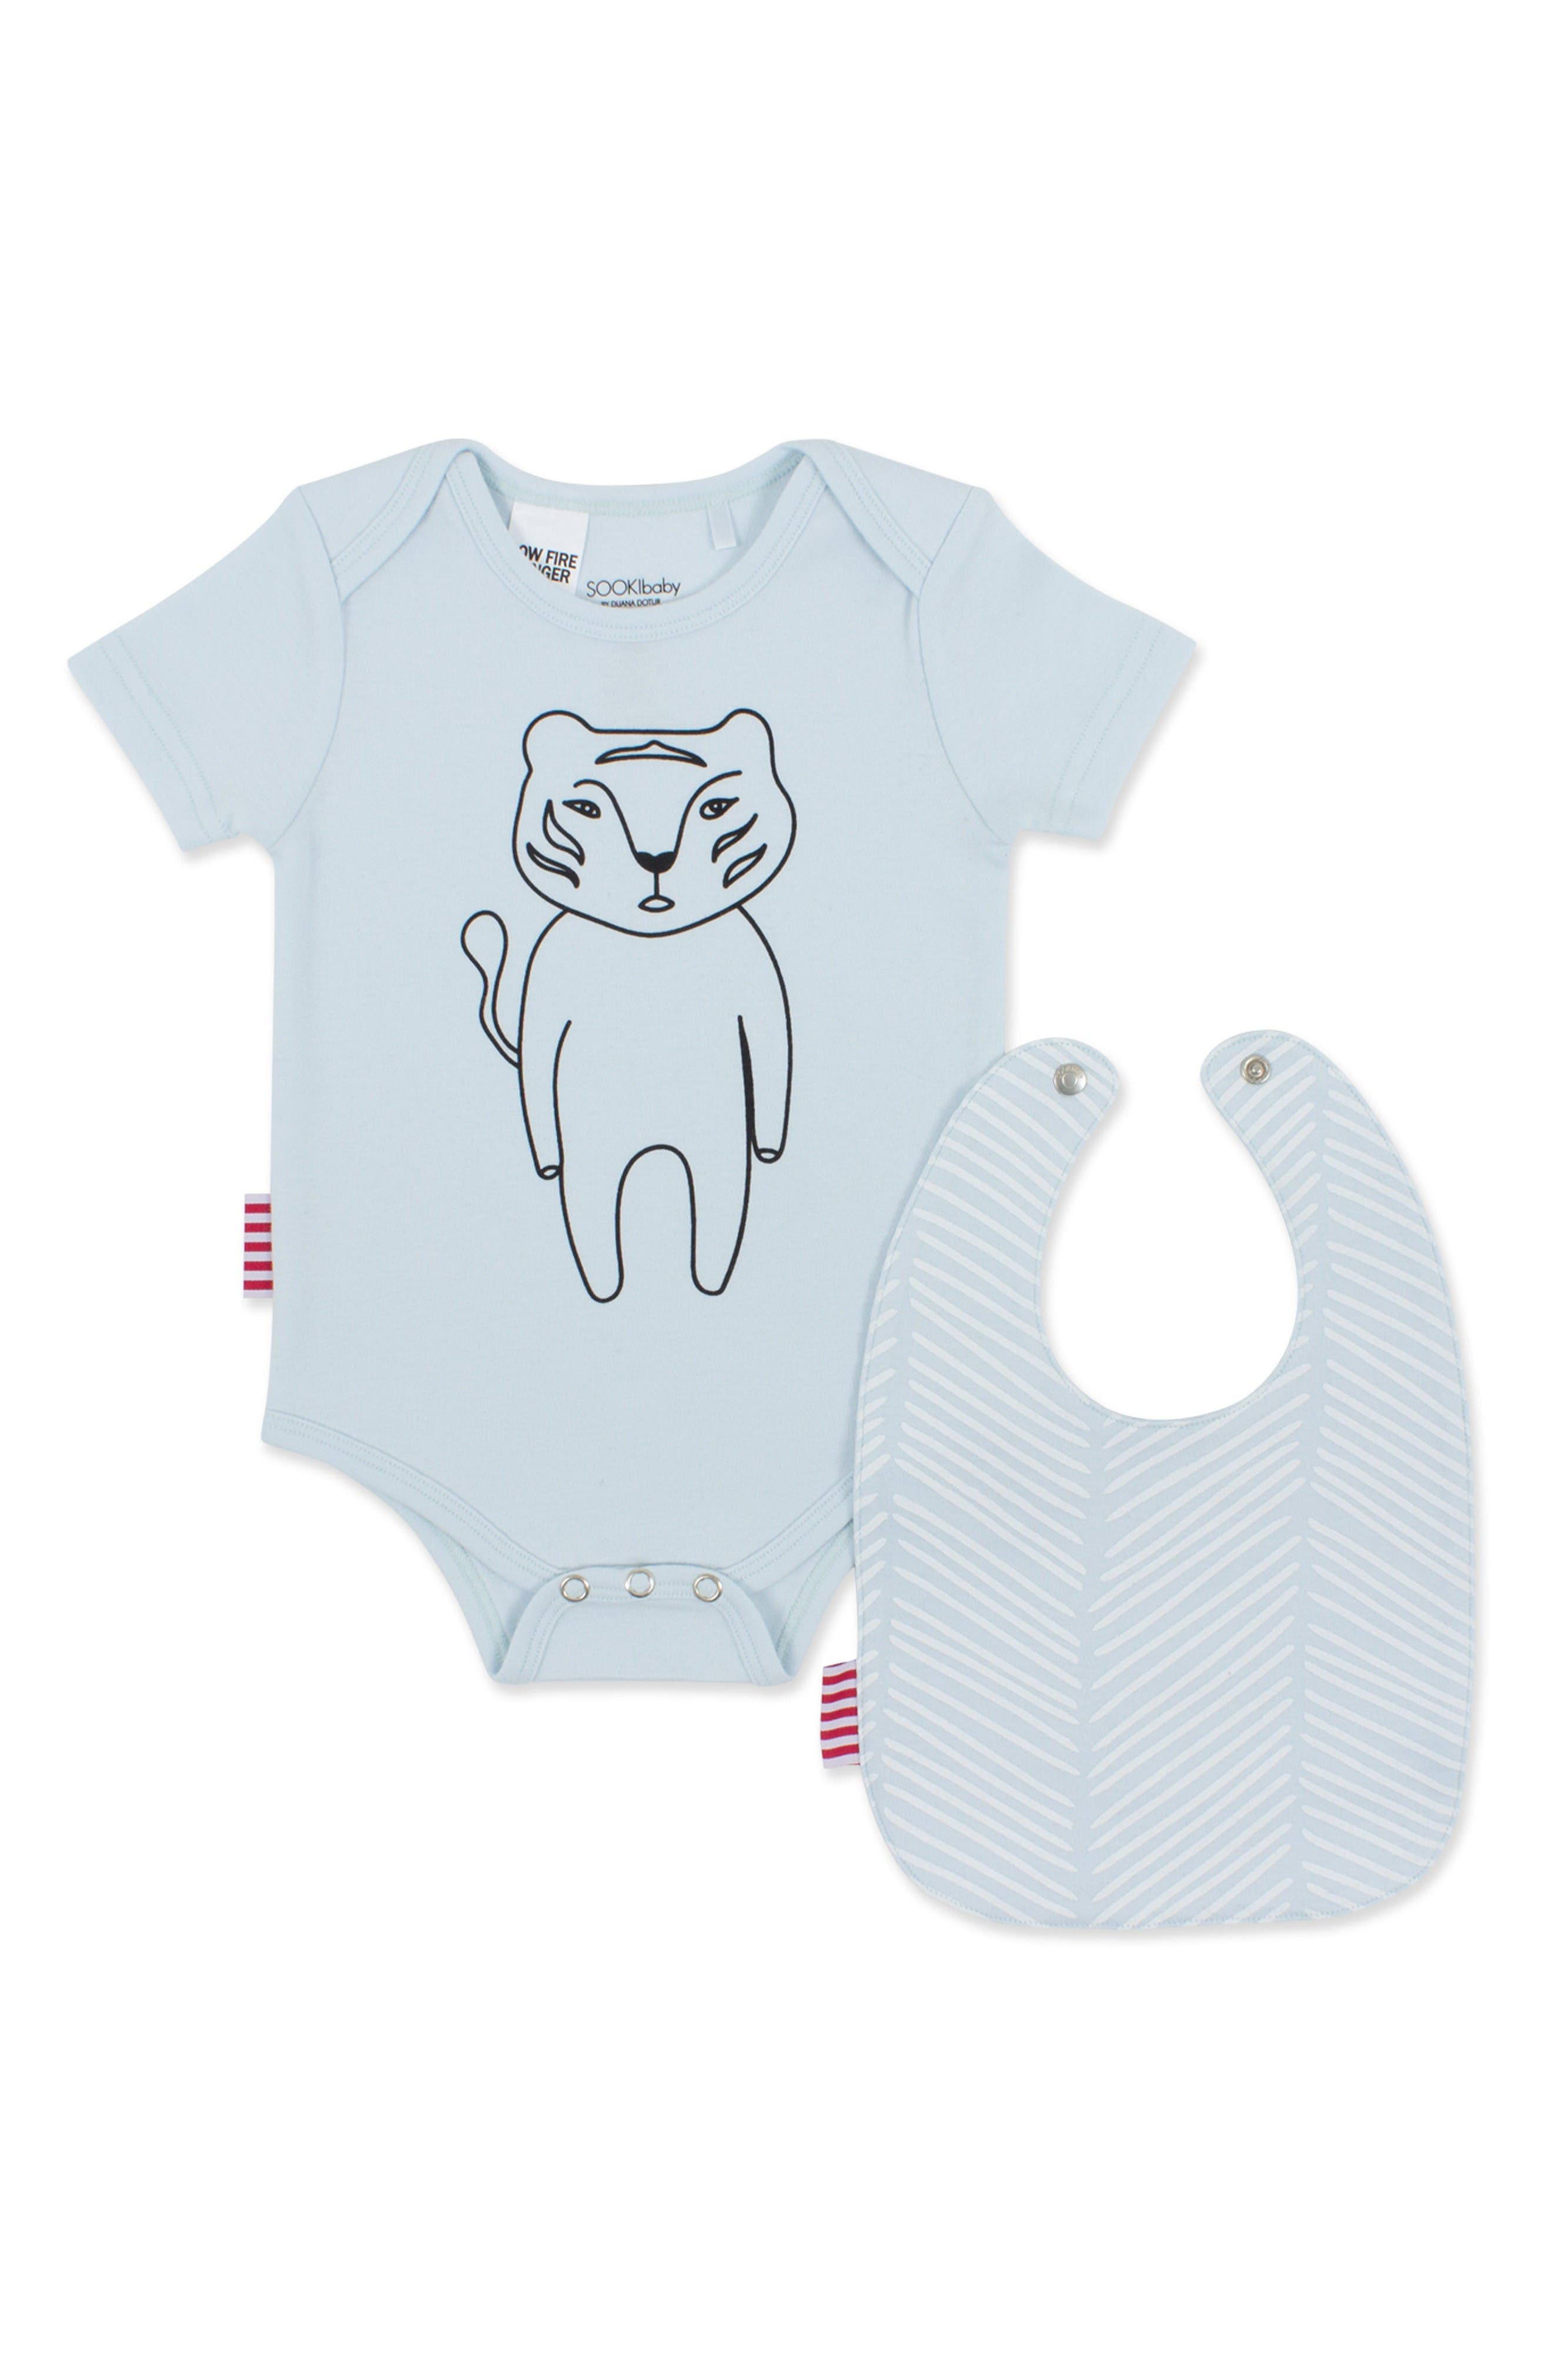 SOOKIbaby Chevron Bodysuit & Bib Set (Baby)